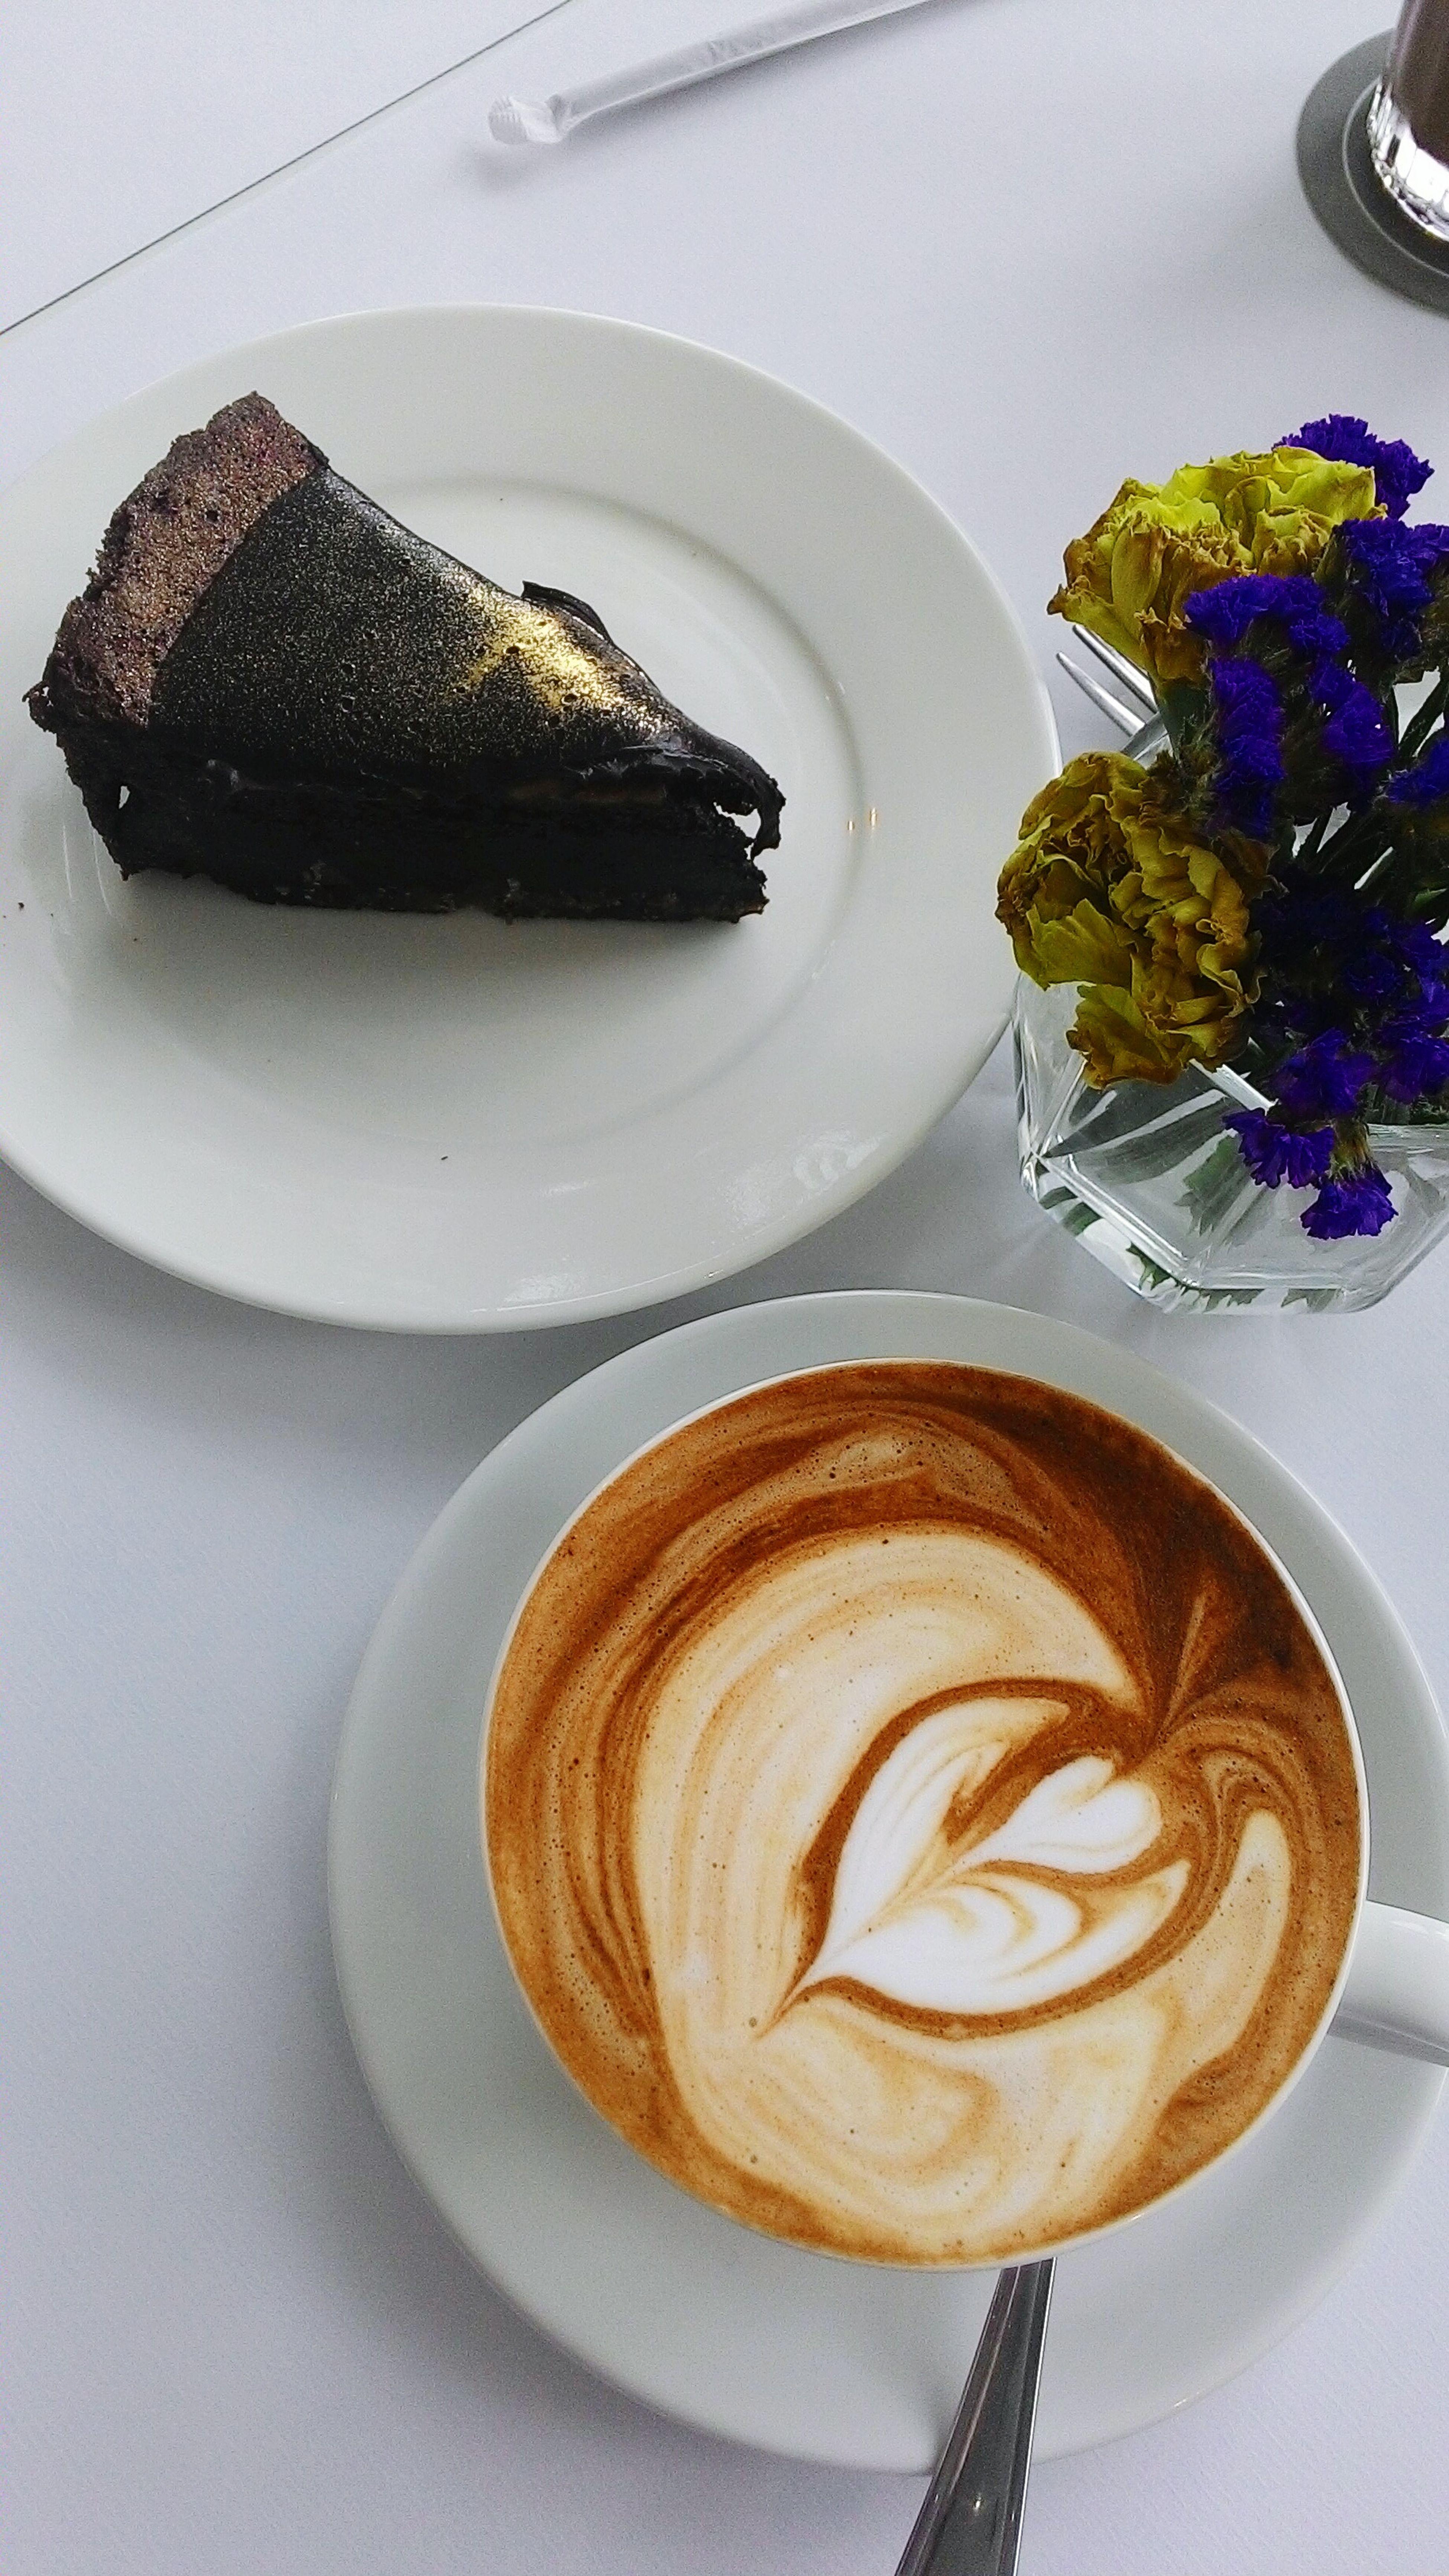 🍰🍰☕☕ Chocolate Cake Cakes Nom Nom Nom Dessert Foody Happiness Is....